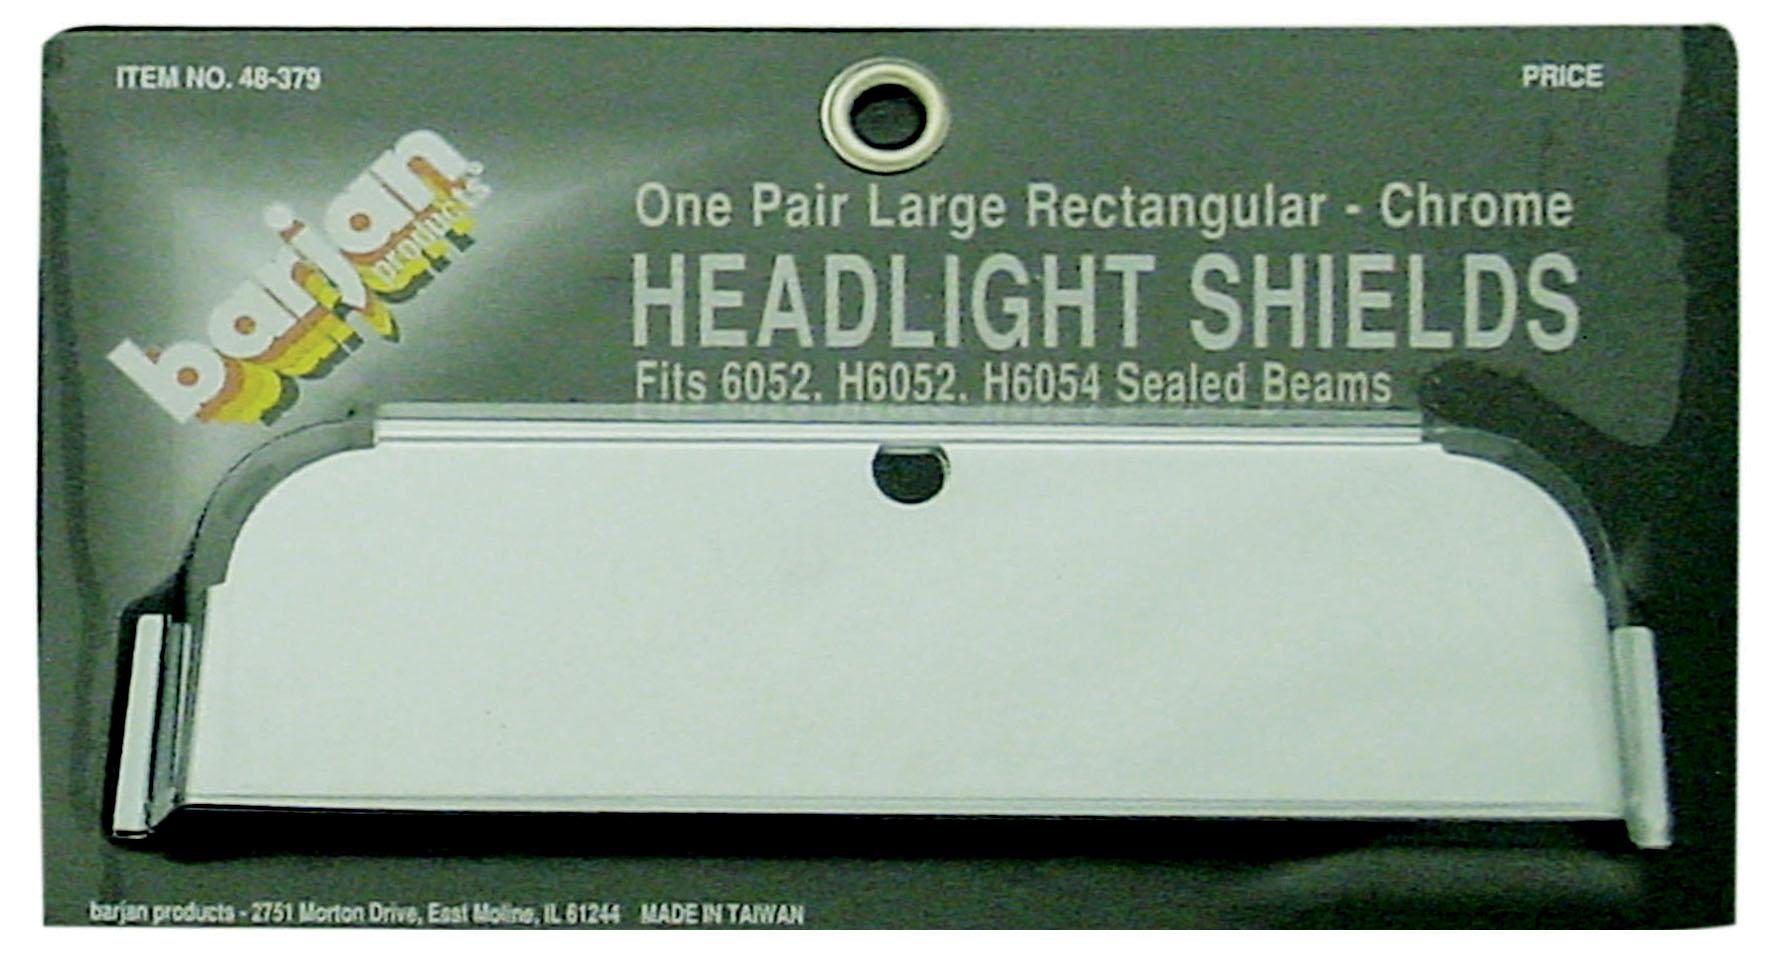 HEADLIGHT SHIELDS LG RECT 1/PR